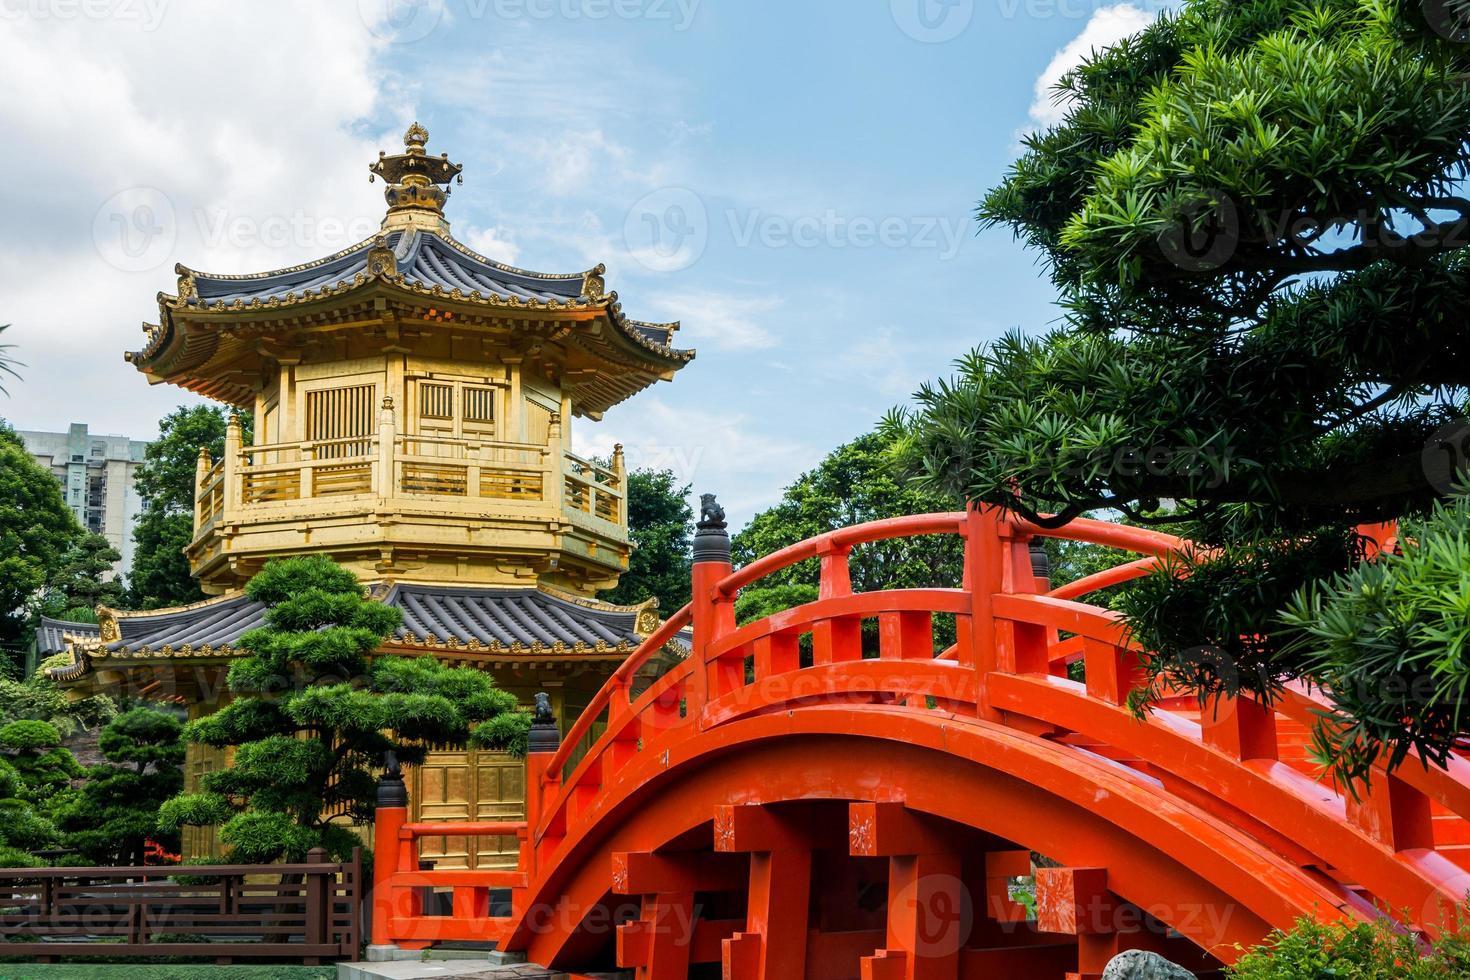 tang-dynastie gouden paviljoen in chi lin nunnery, hong kong foto